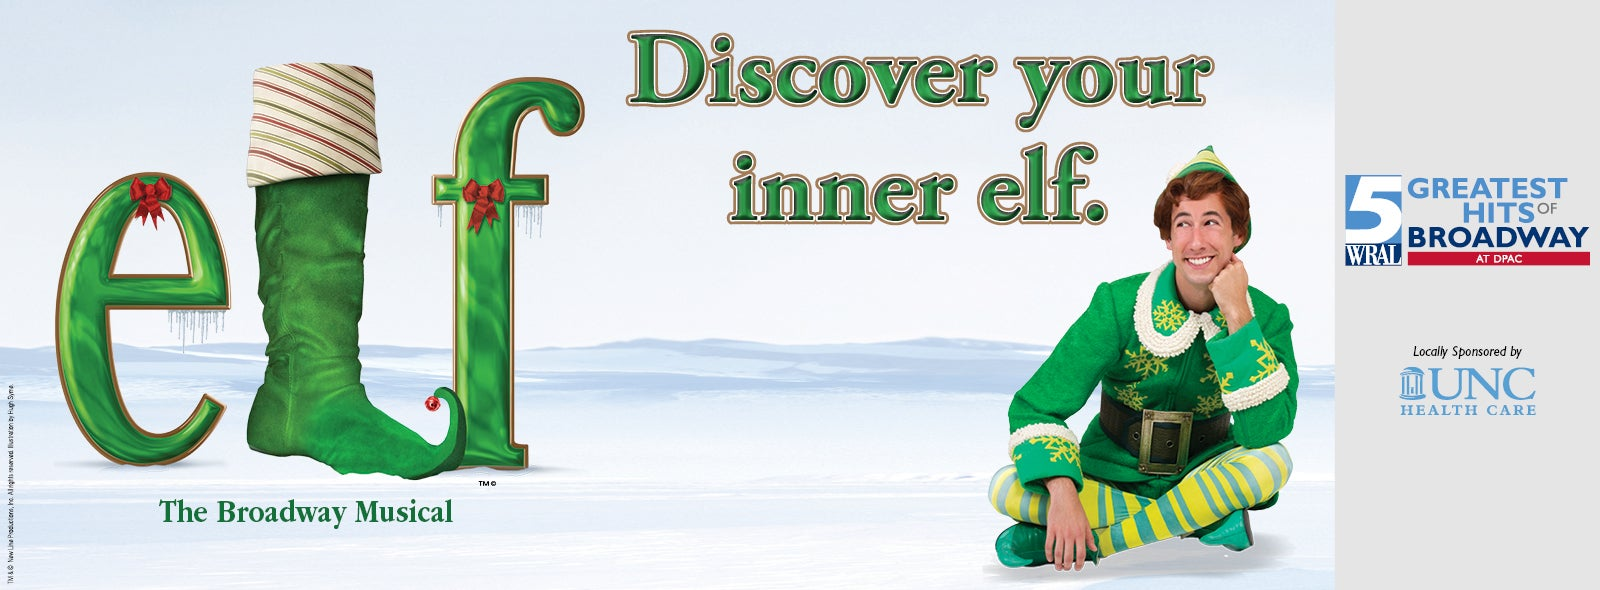 Elf1600x590.jpg